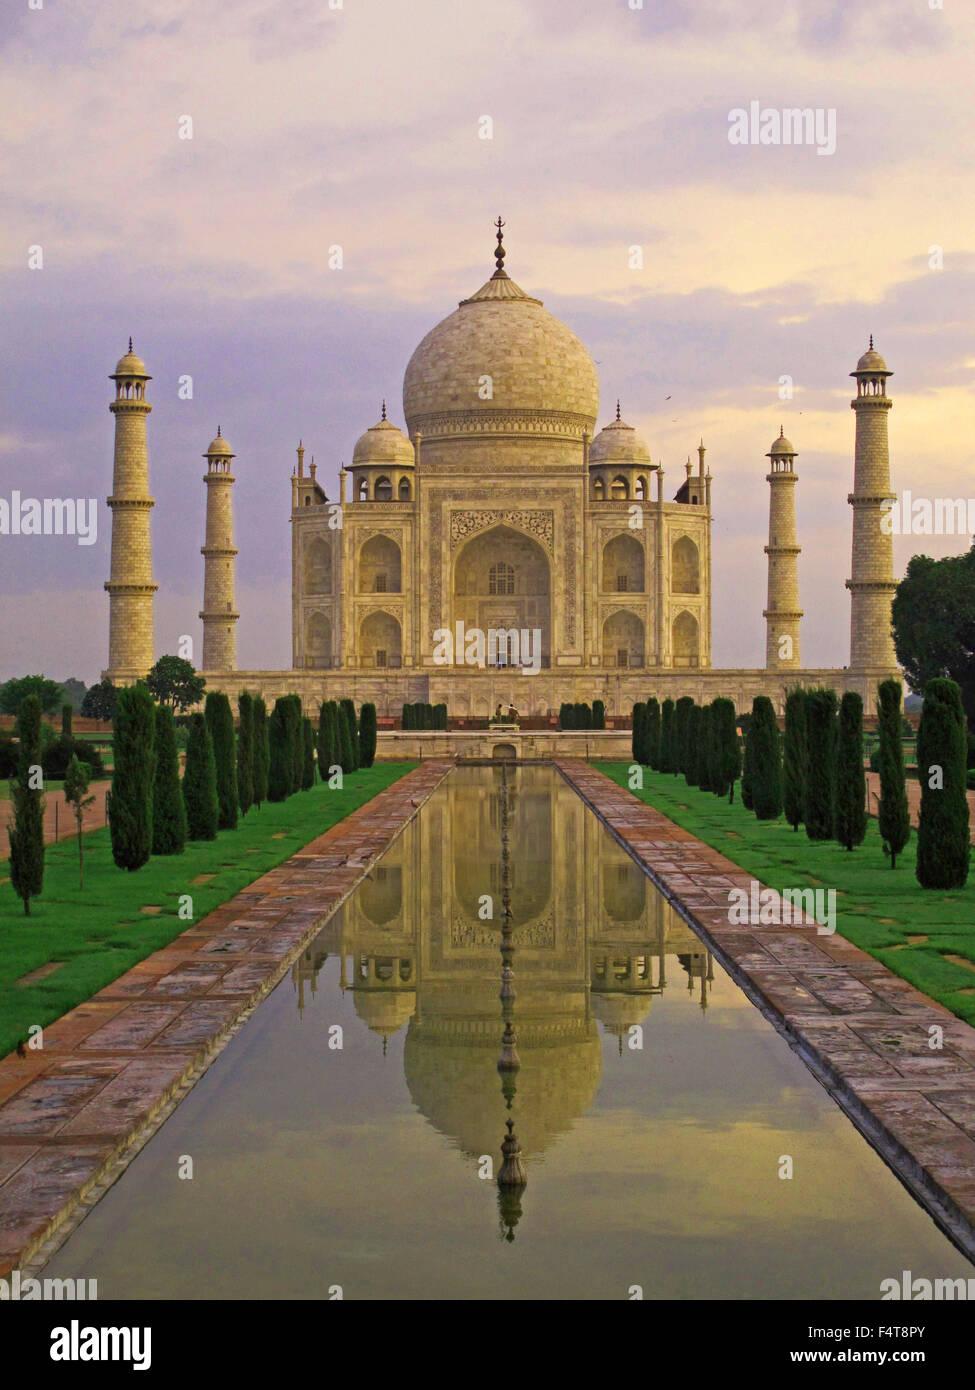 Das Taj Mahal bei Sonnenaufgang in Indien, Agra, weißen Marmor Morgenwache Stockbild